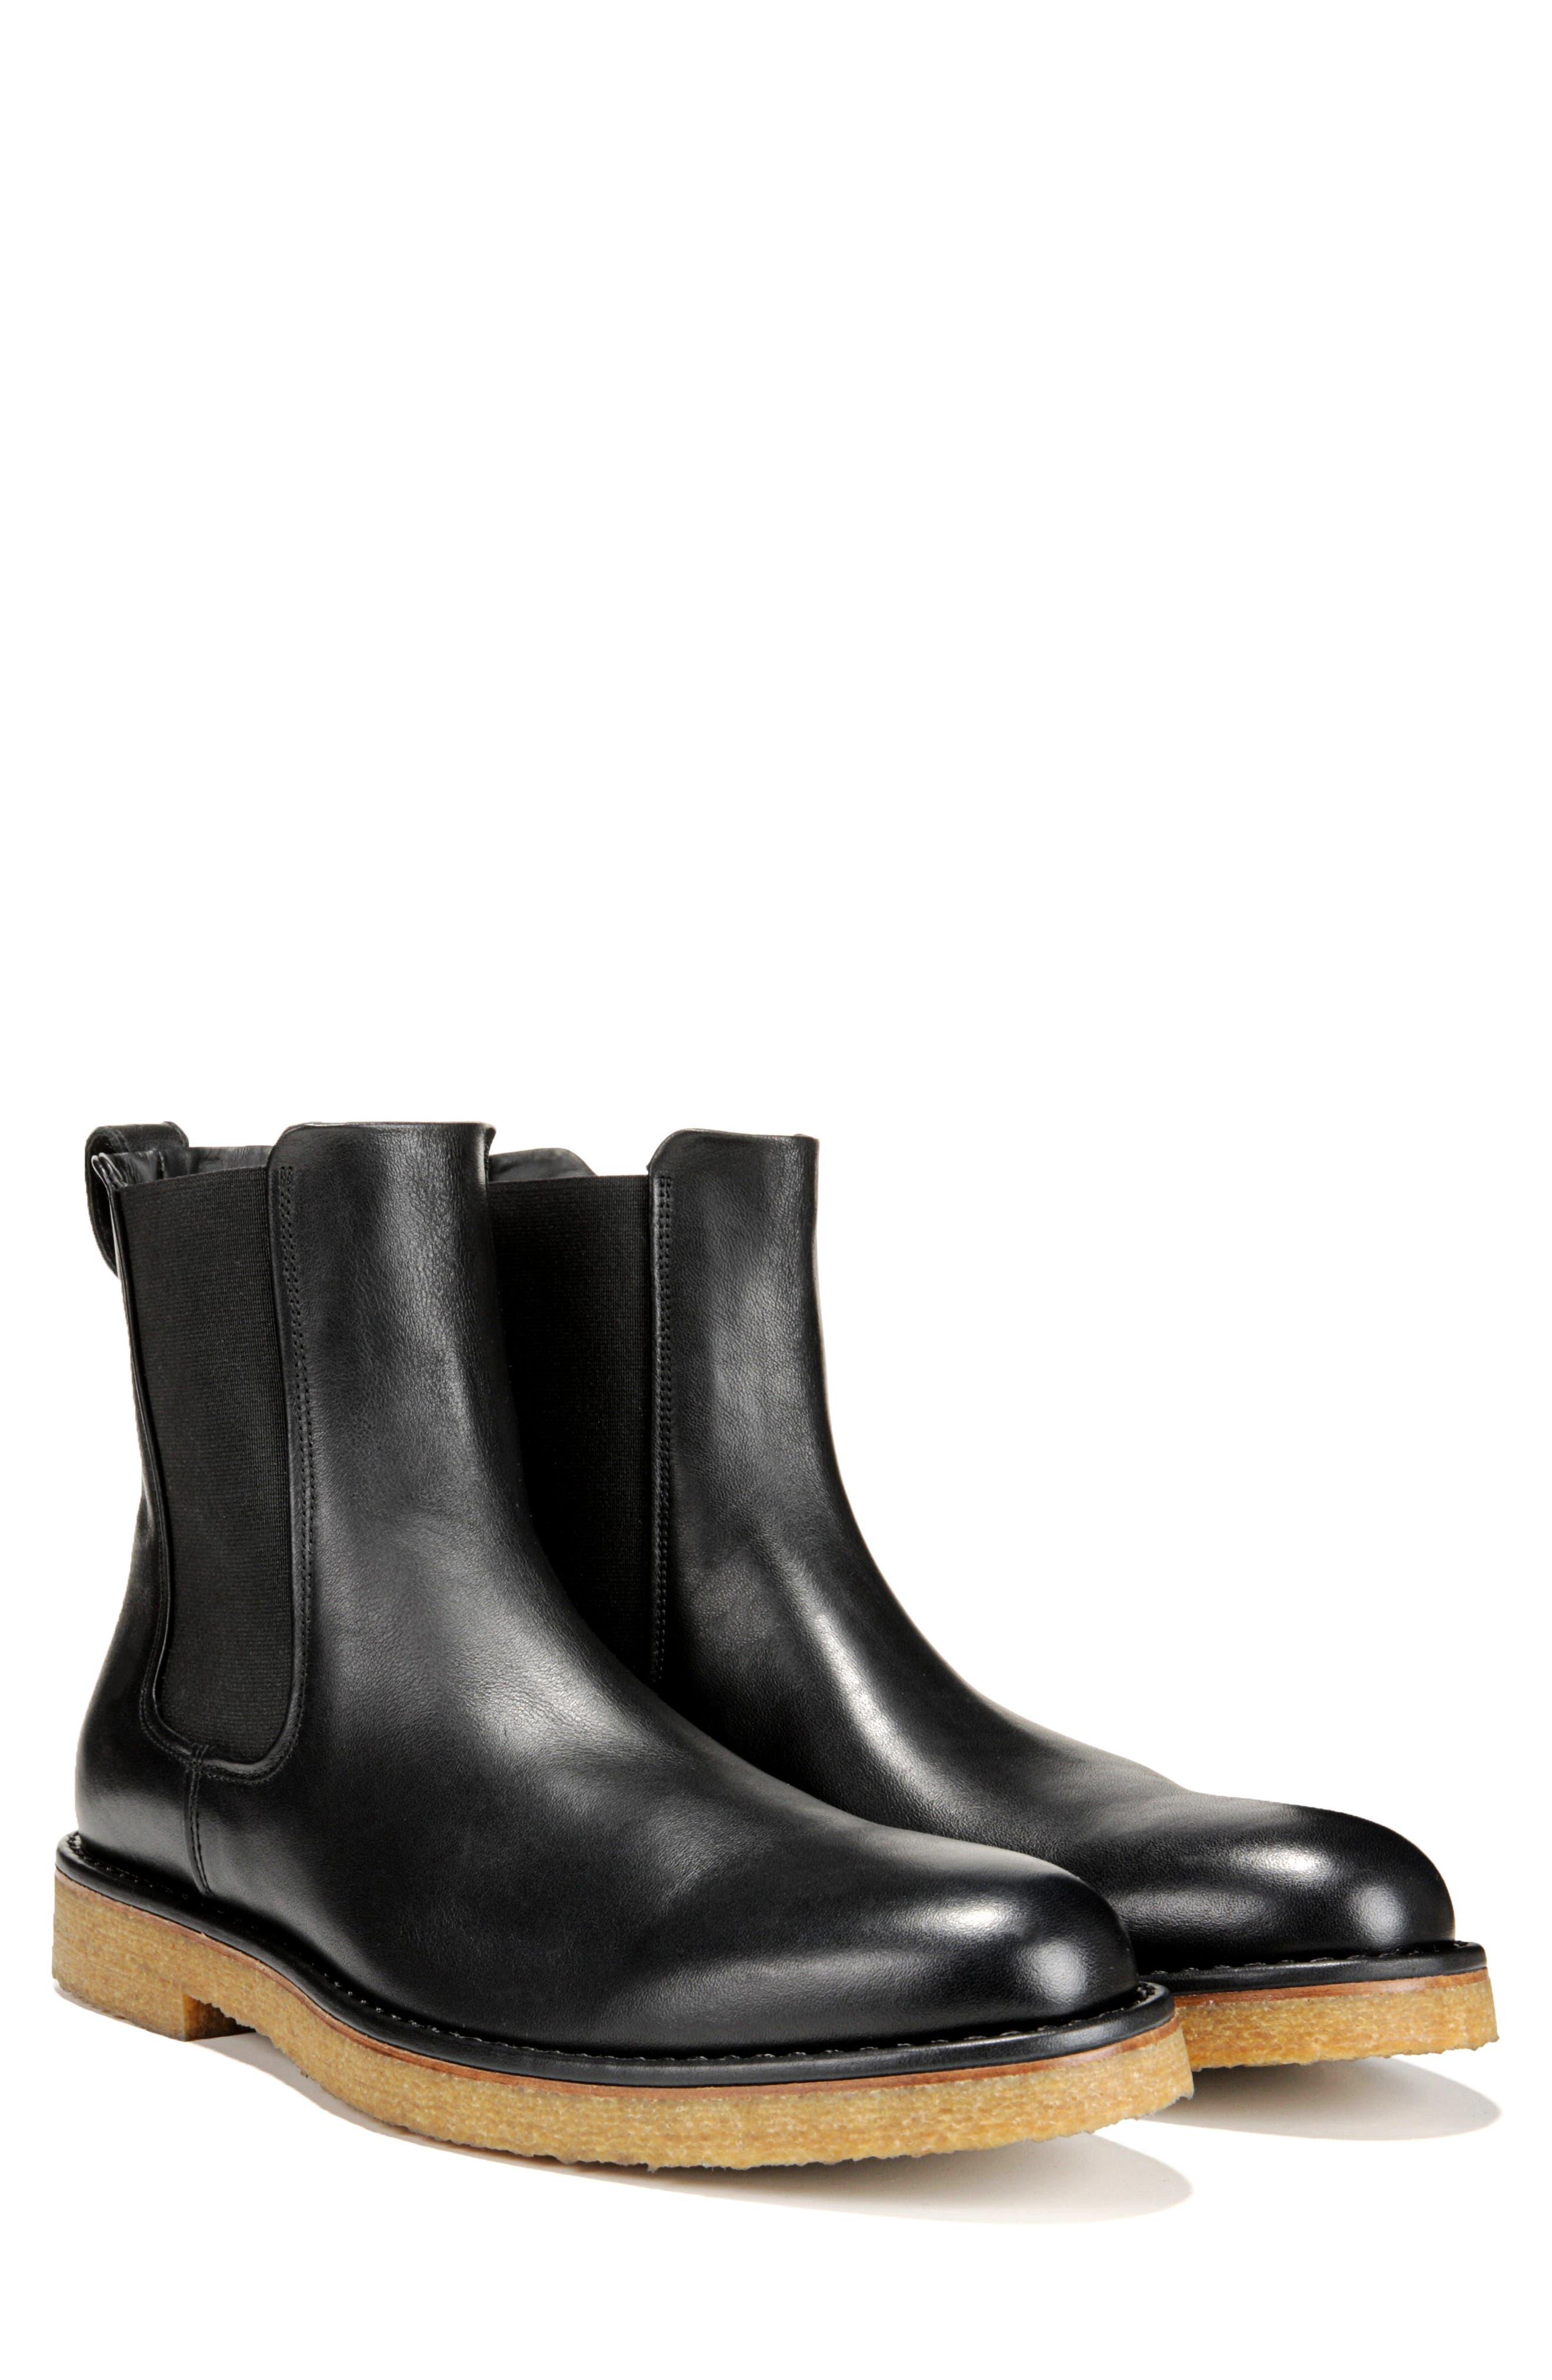 Cresslor Chelsea Boot,                             Alternate thumbnail 7, color,                             BLACK